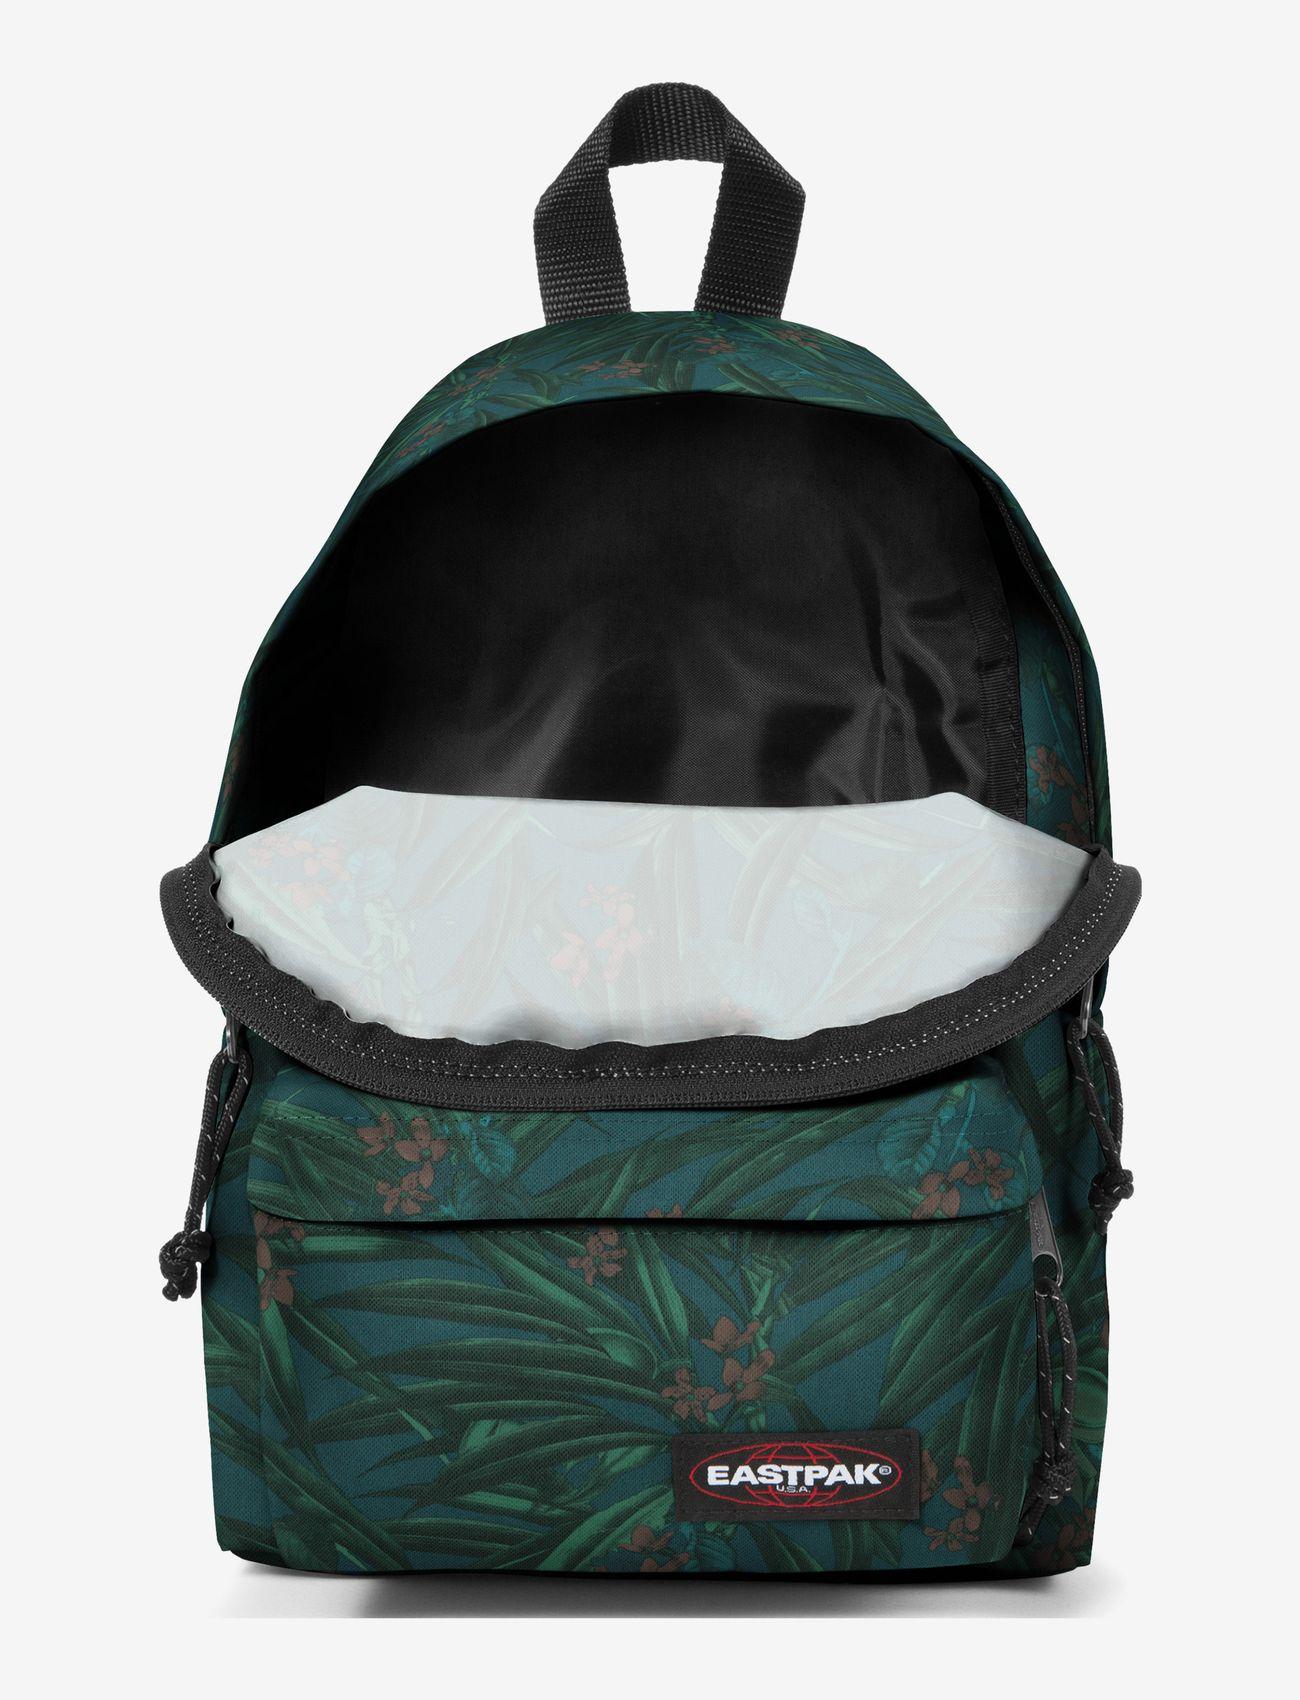 Eastpak - ORBIT - rucksäcke - brize mel dark - 1